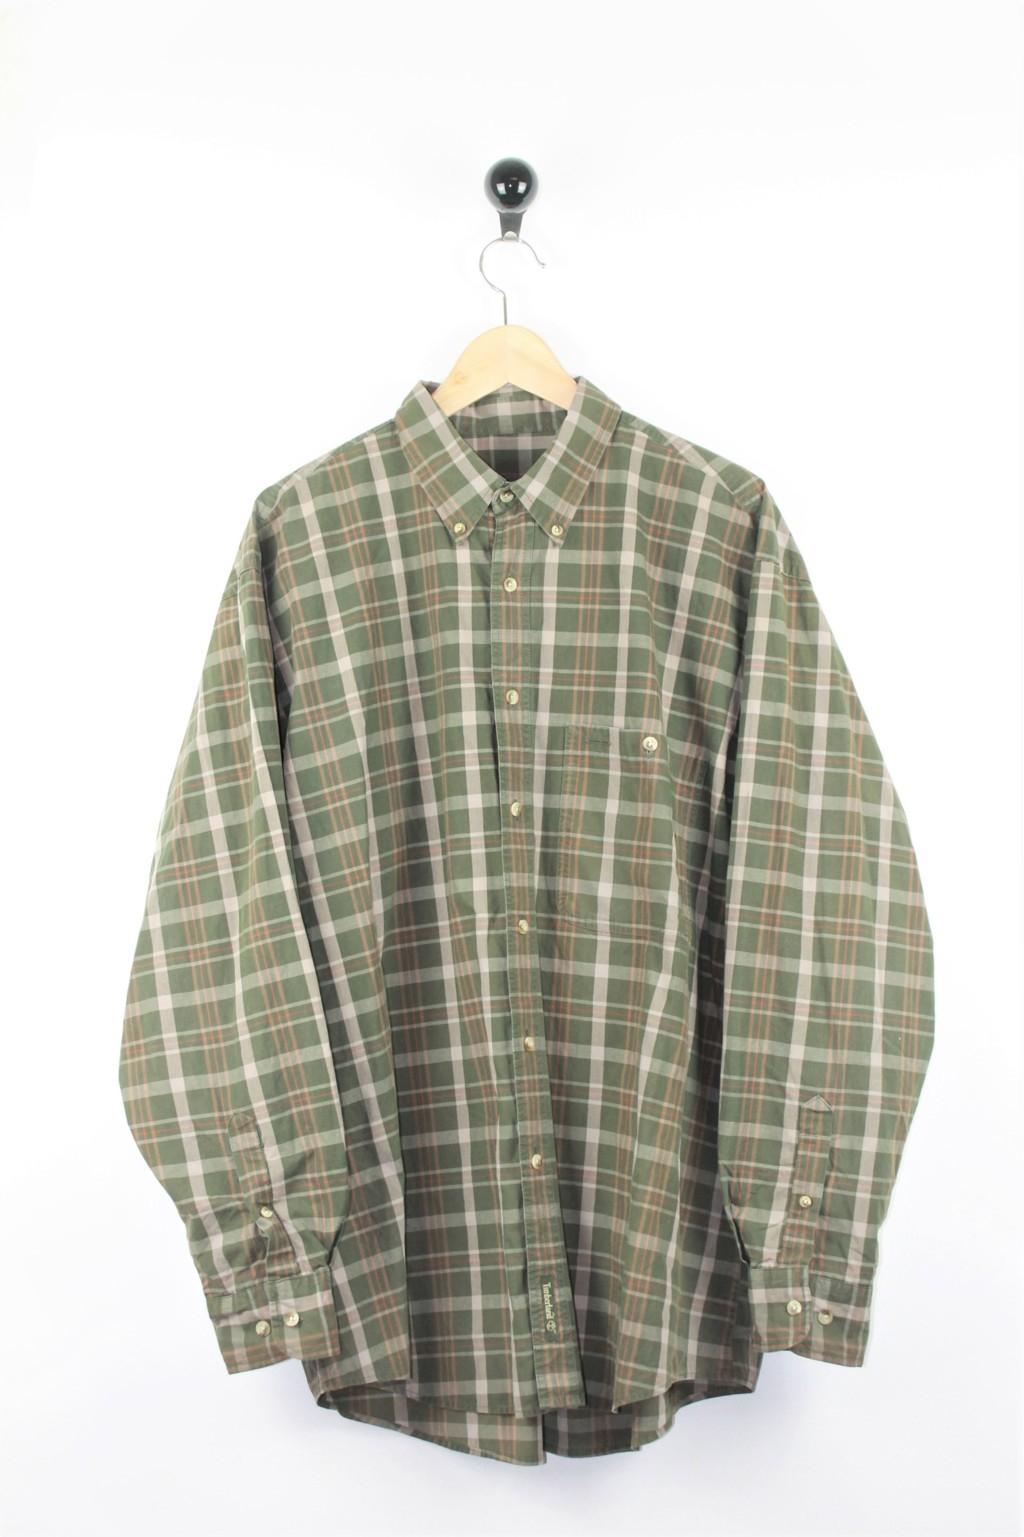 Timberland - Camicia cotone